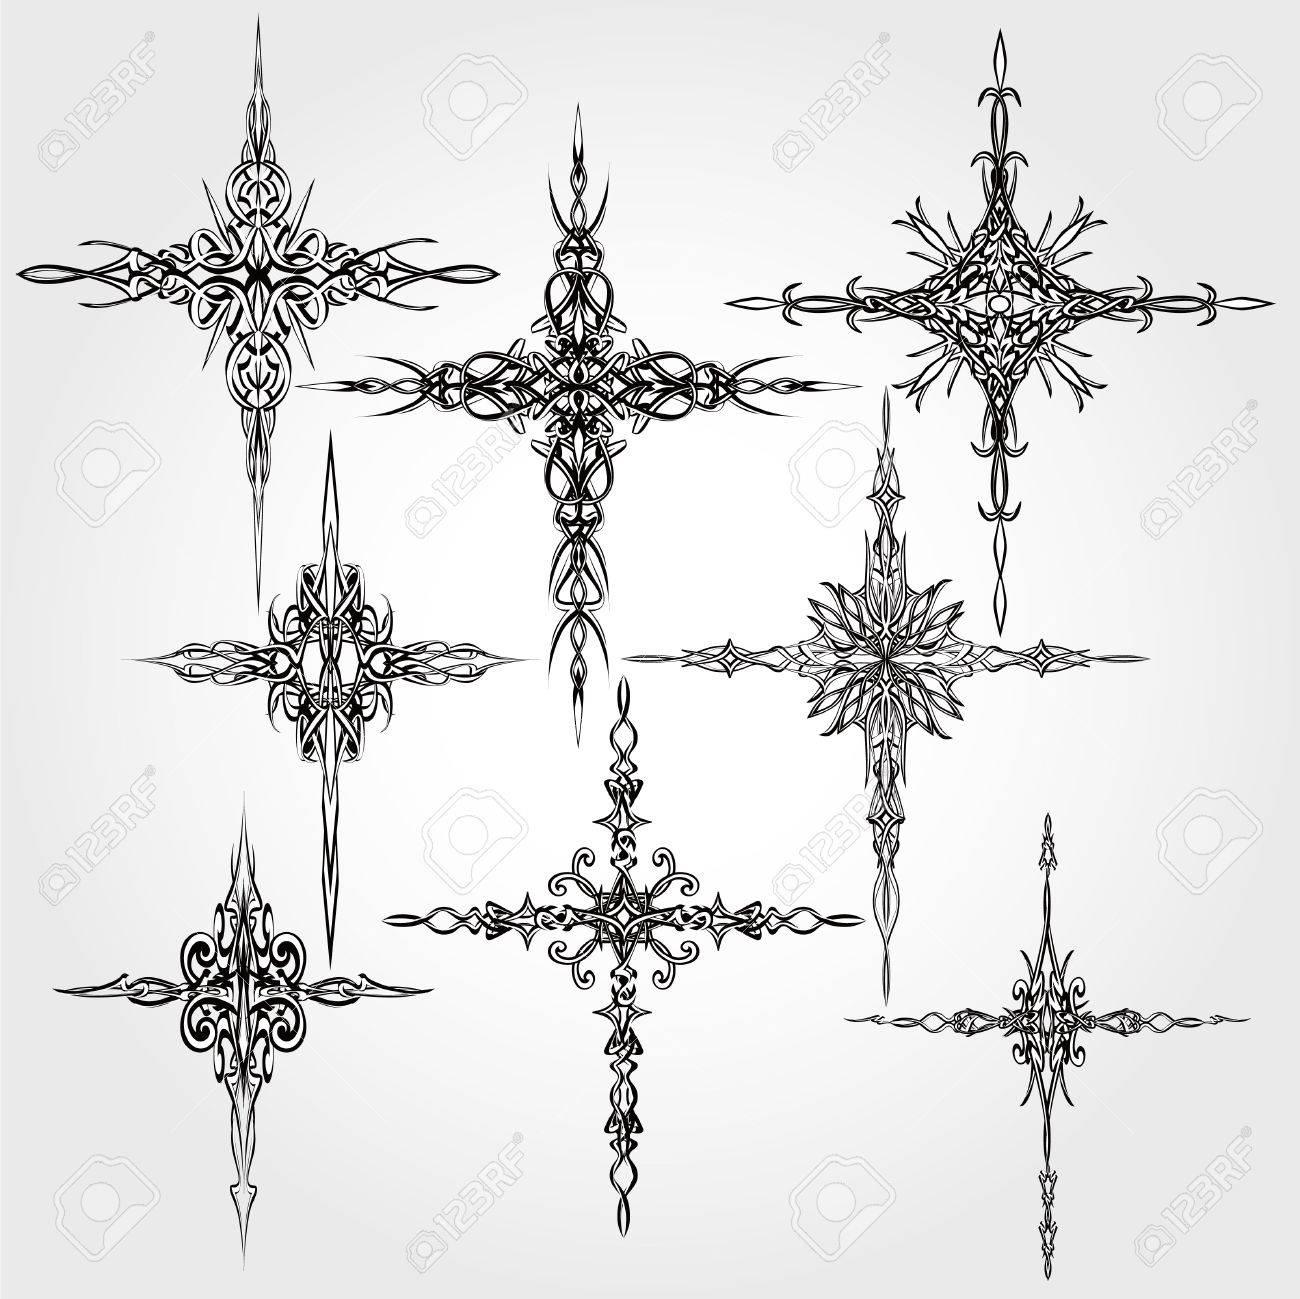 decorative cross design elements set on light background stock vector 39439844 - Decorative Cross